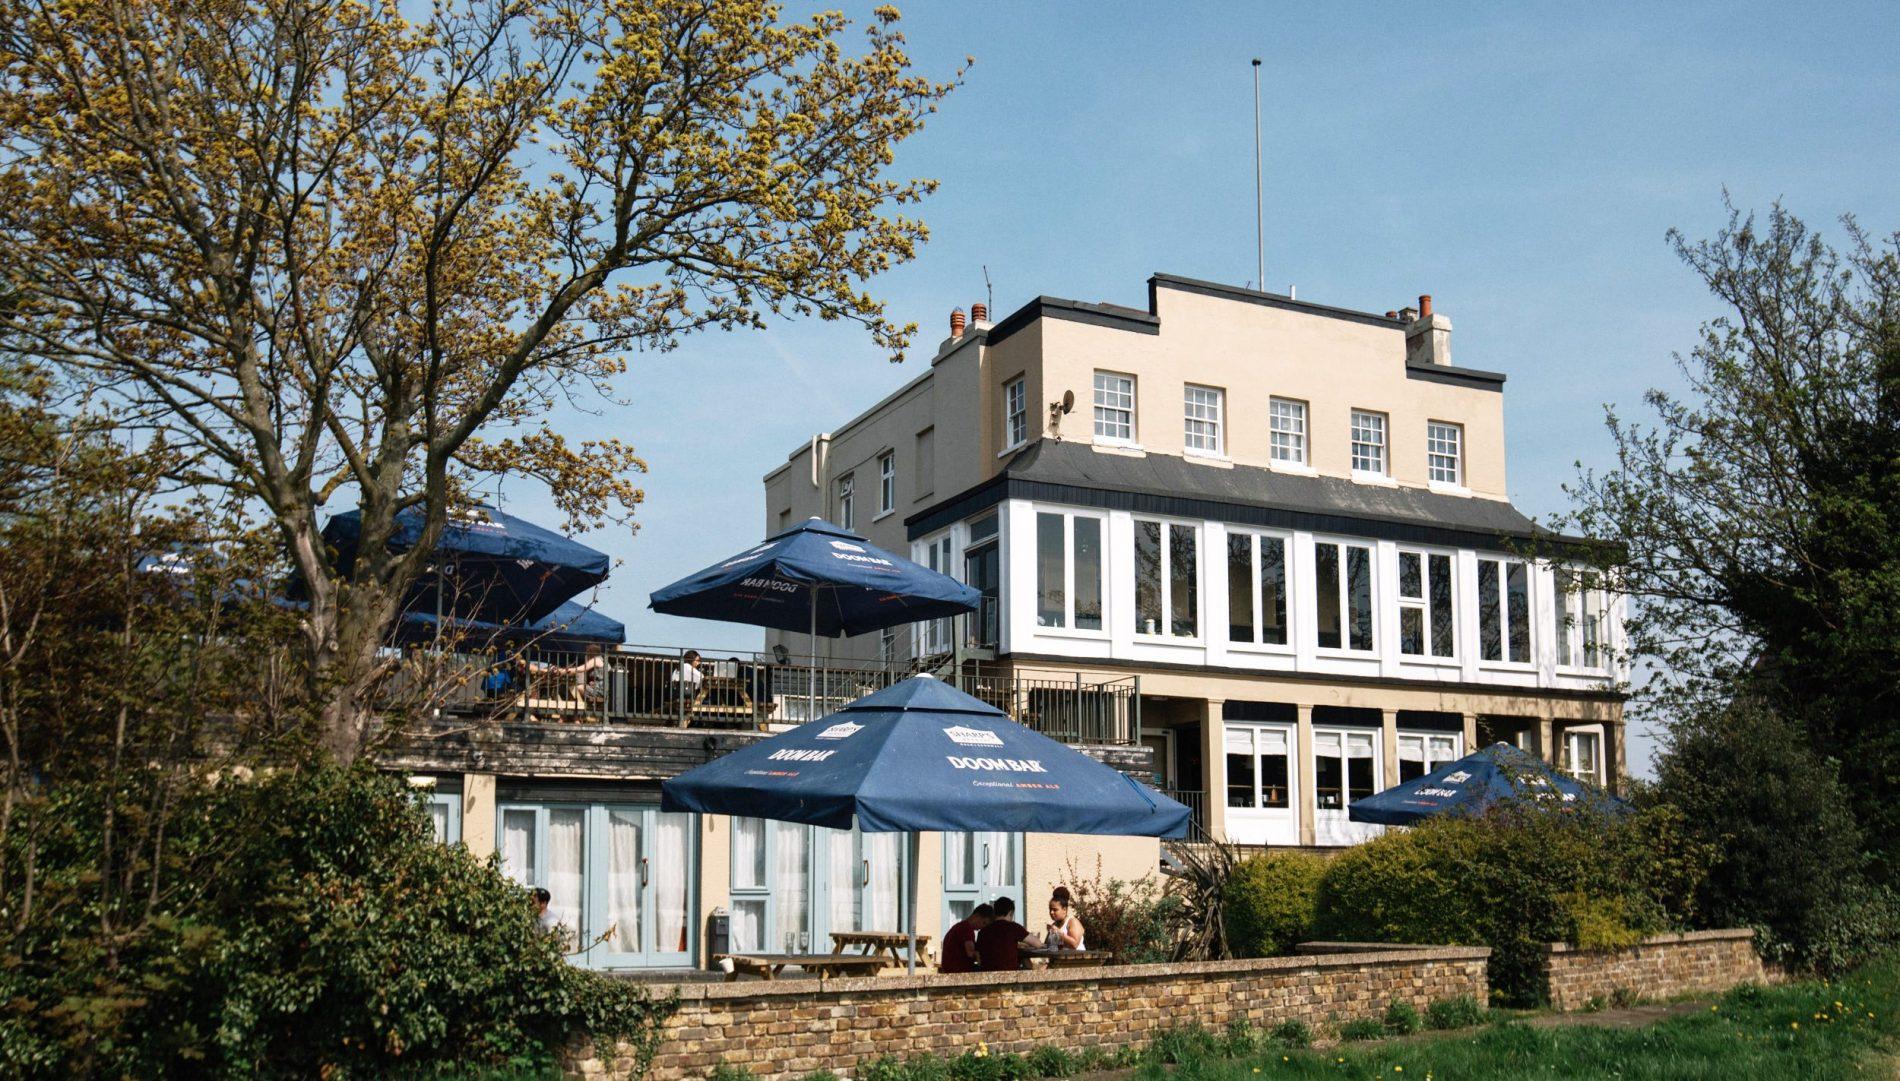 The Royal Hotel, Purfleet